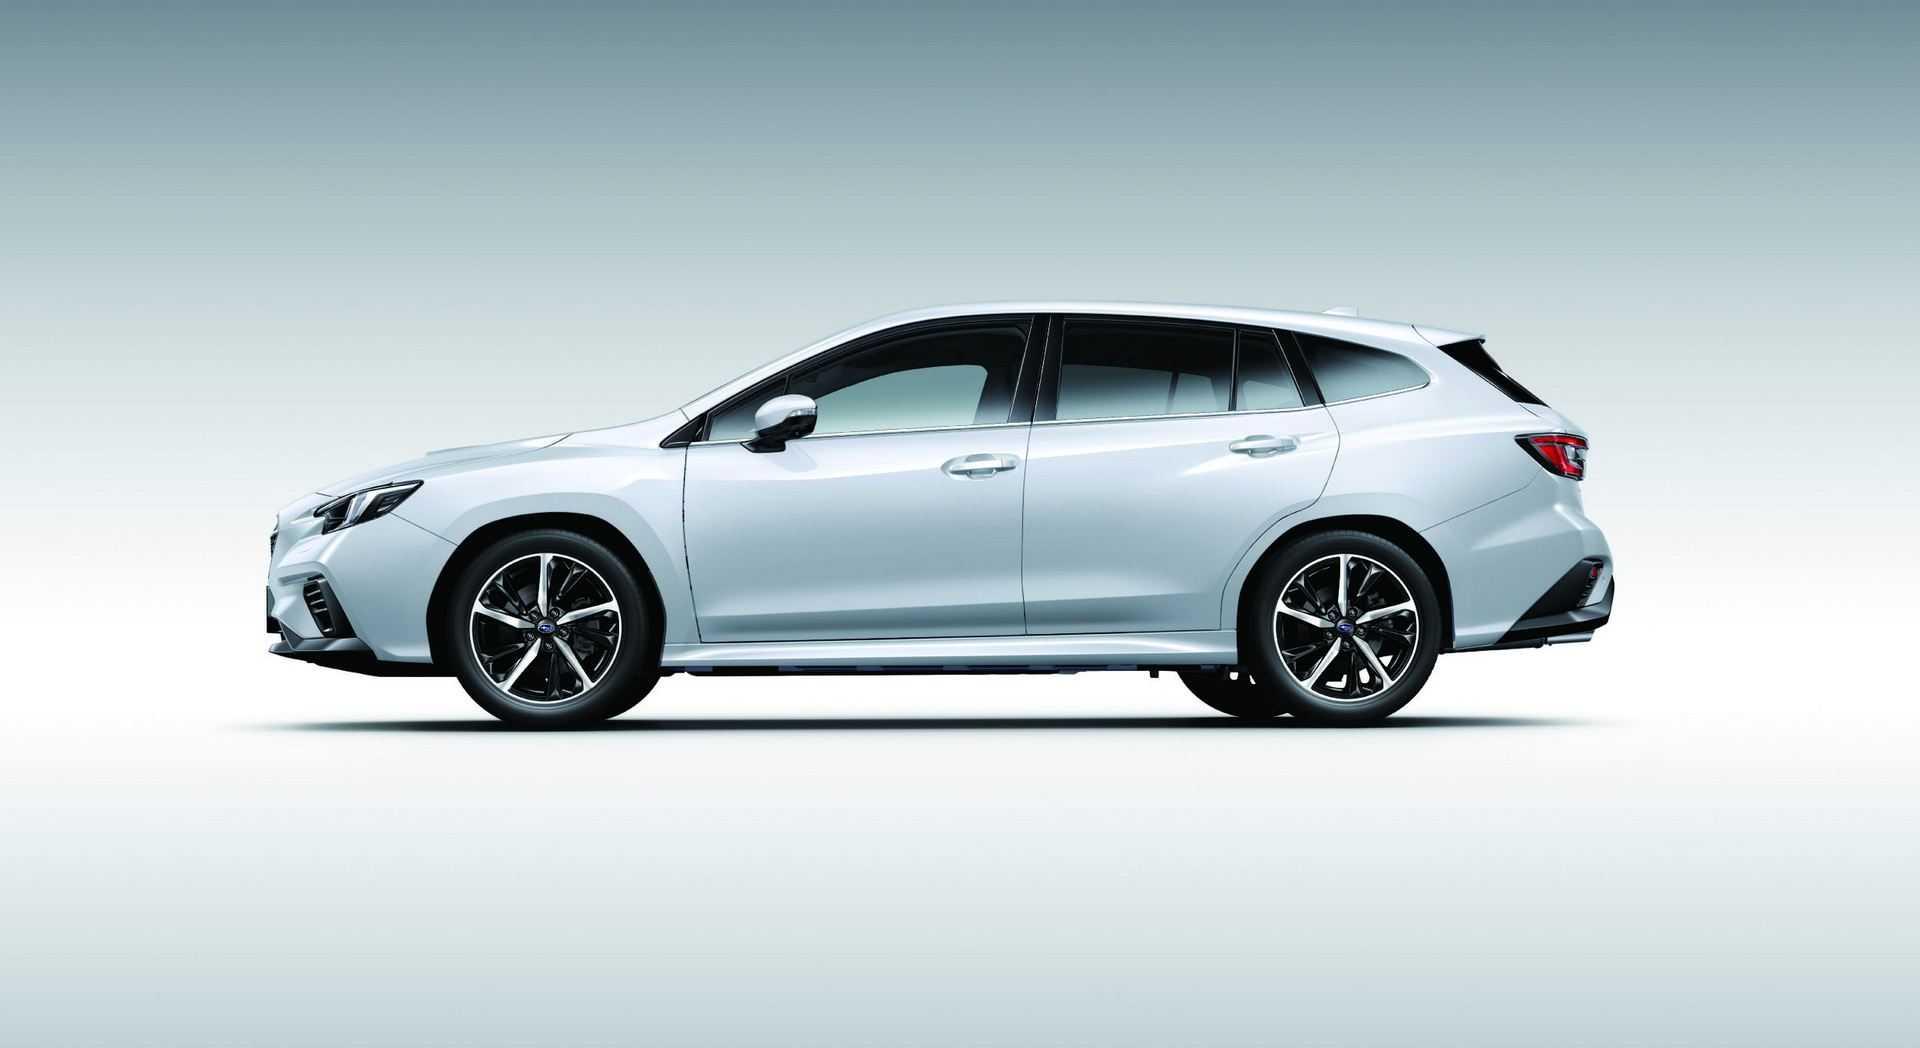 2021_Subaru_Levorg_0128